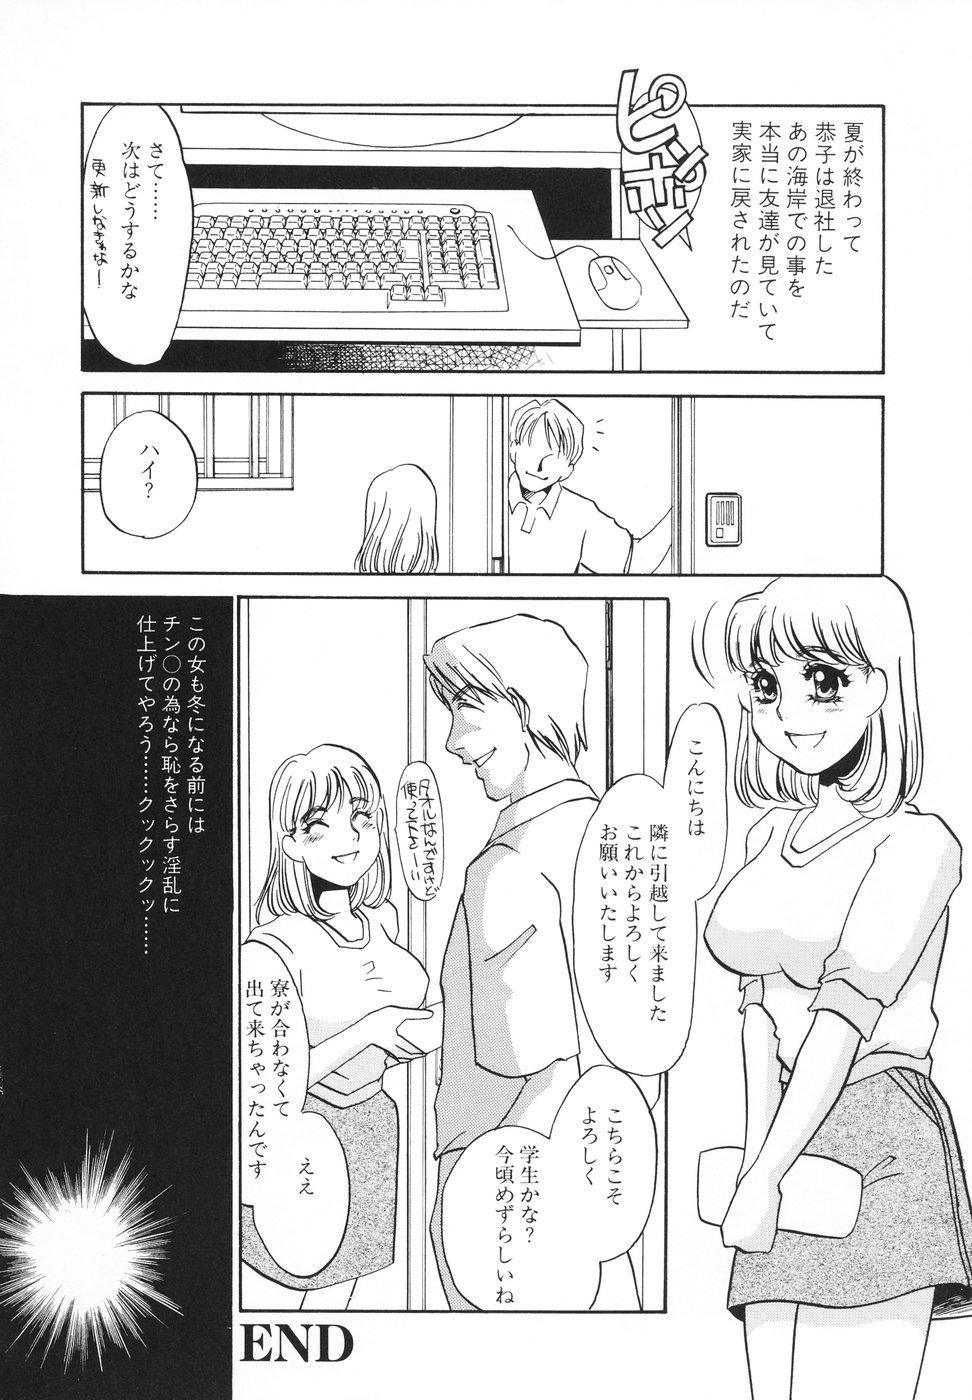 Hentai Inran 20